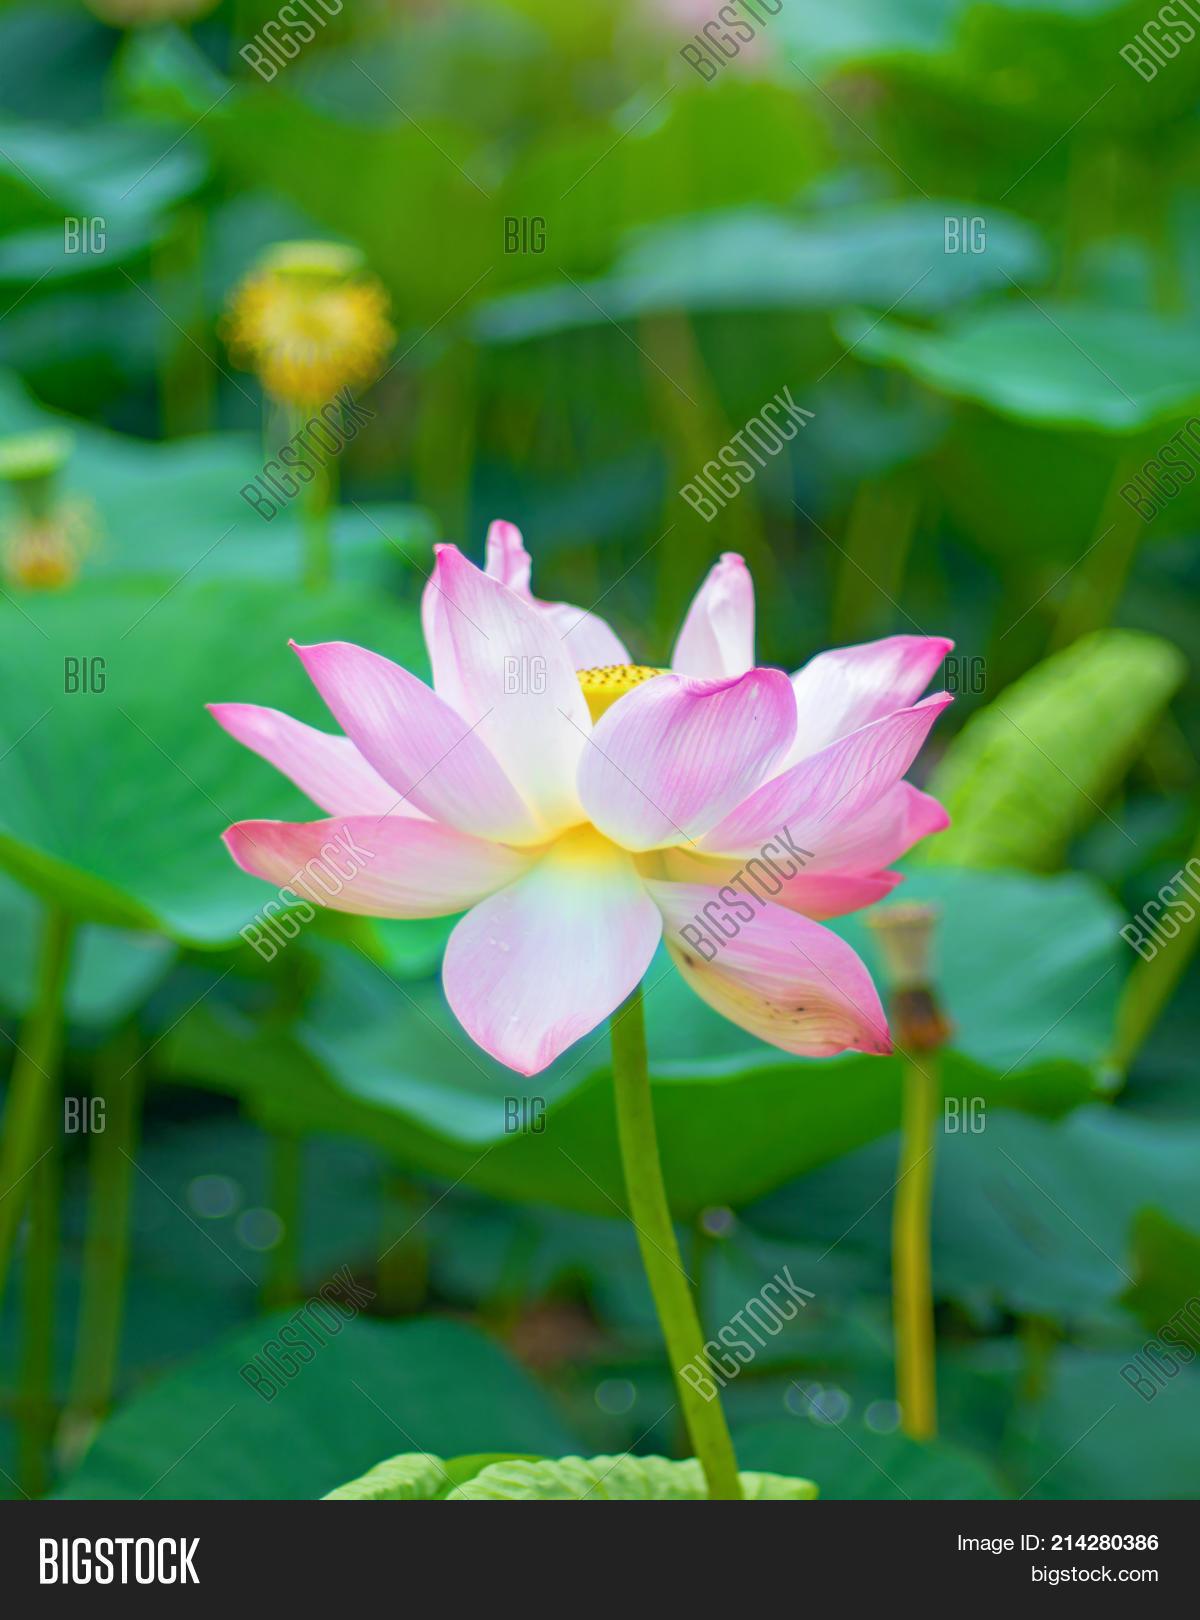 Large Lotus Flowers Image Photo Free Trial Bigstock